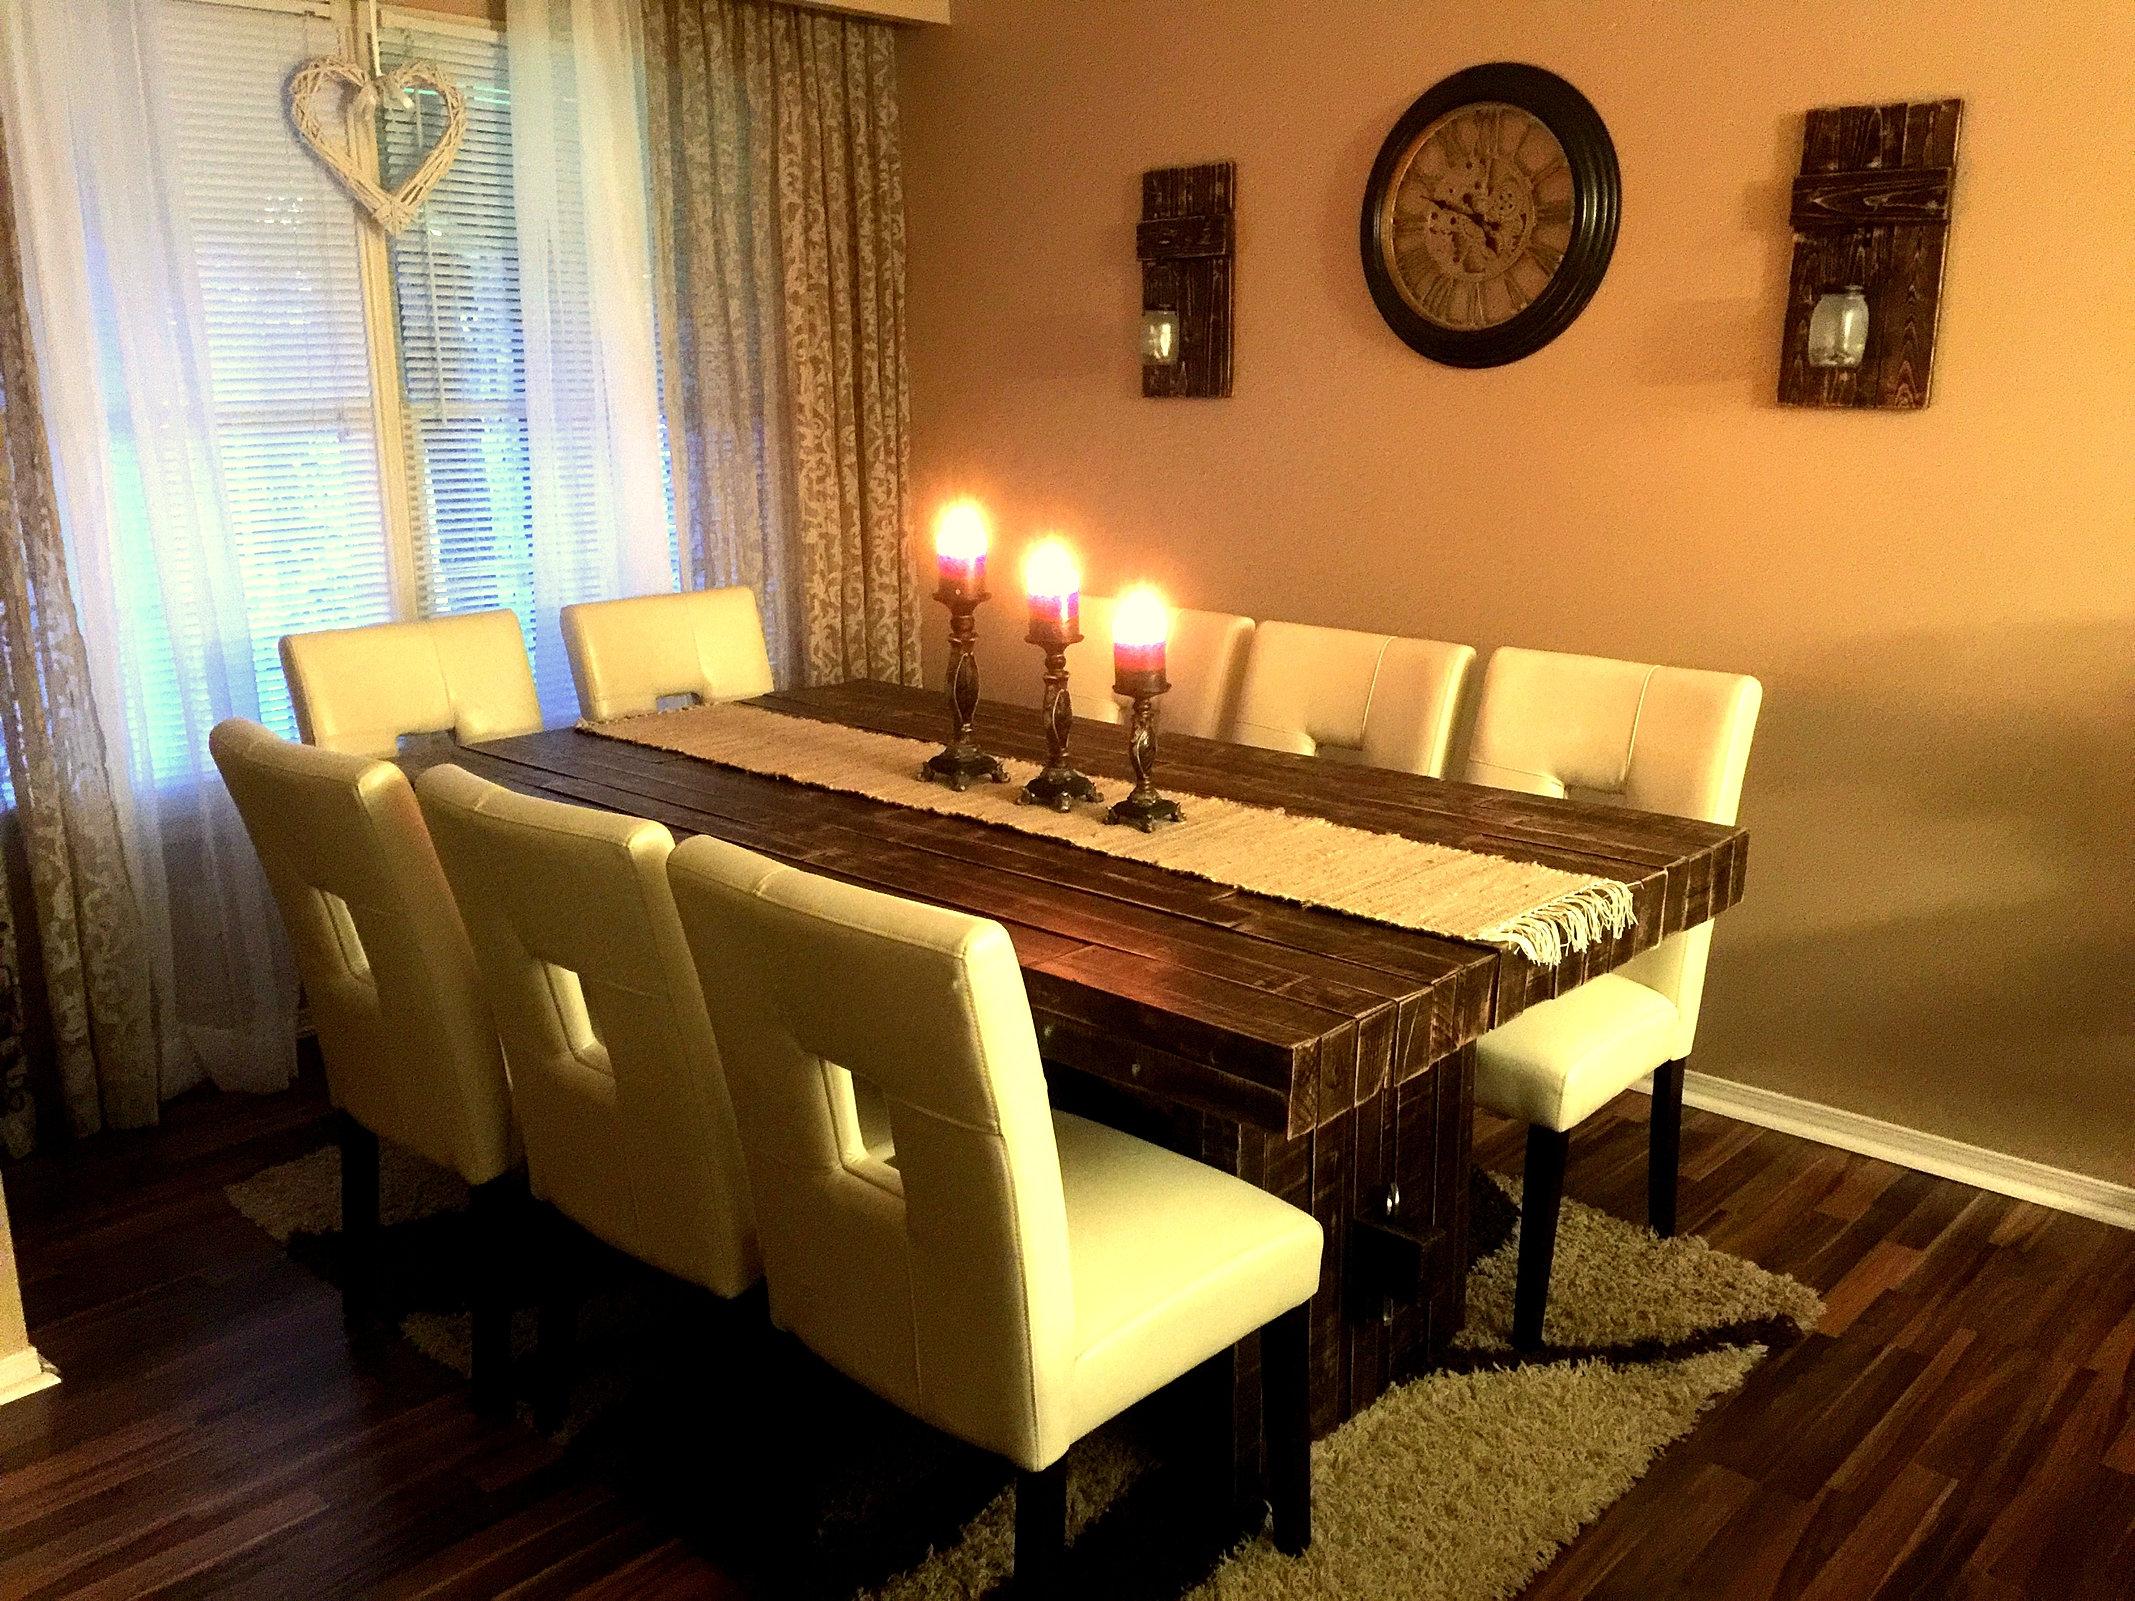 Dining Room Side Tables Rustic Modern Furniture Niagara Custom Design Rustic Wood Furniture